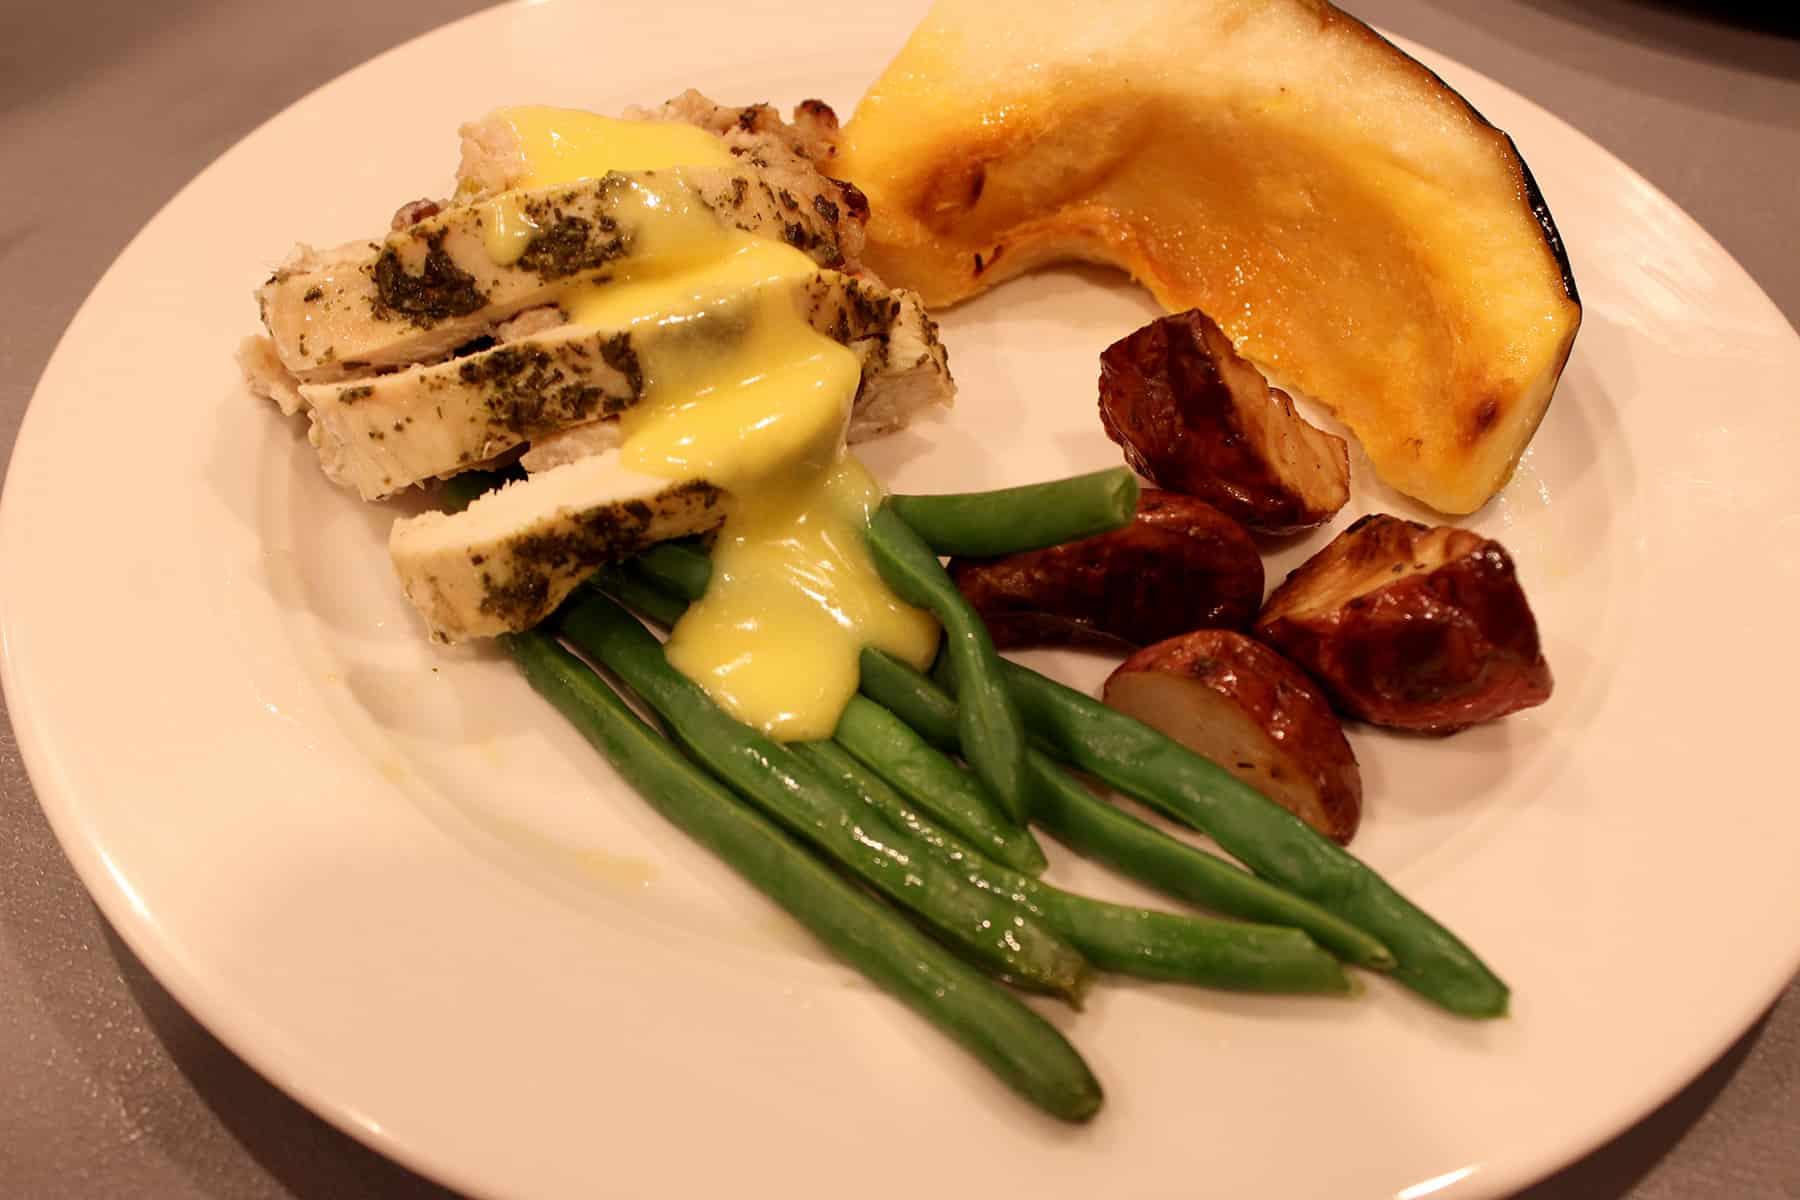 Nutritious Foods at Mennonite Village